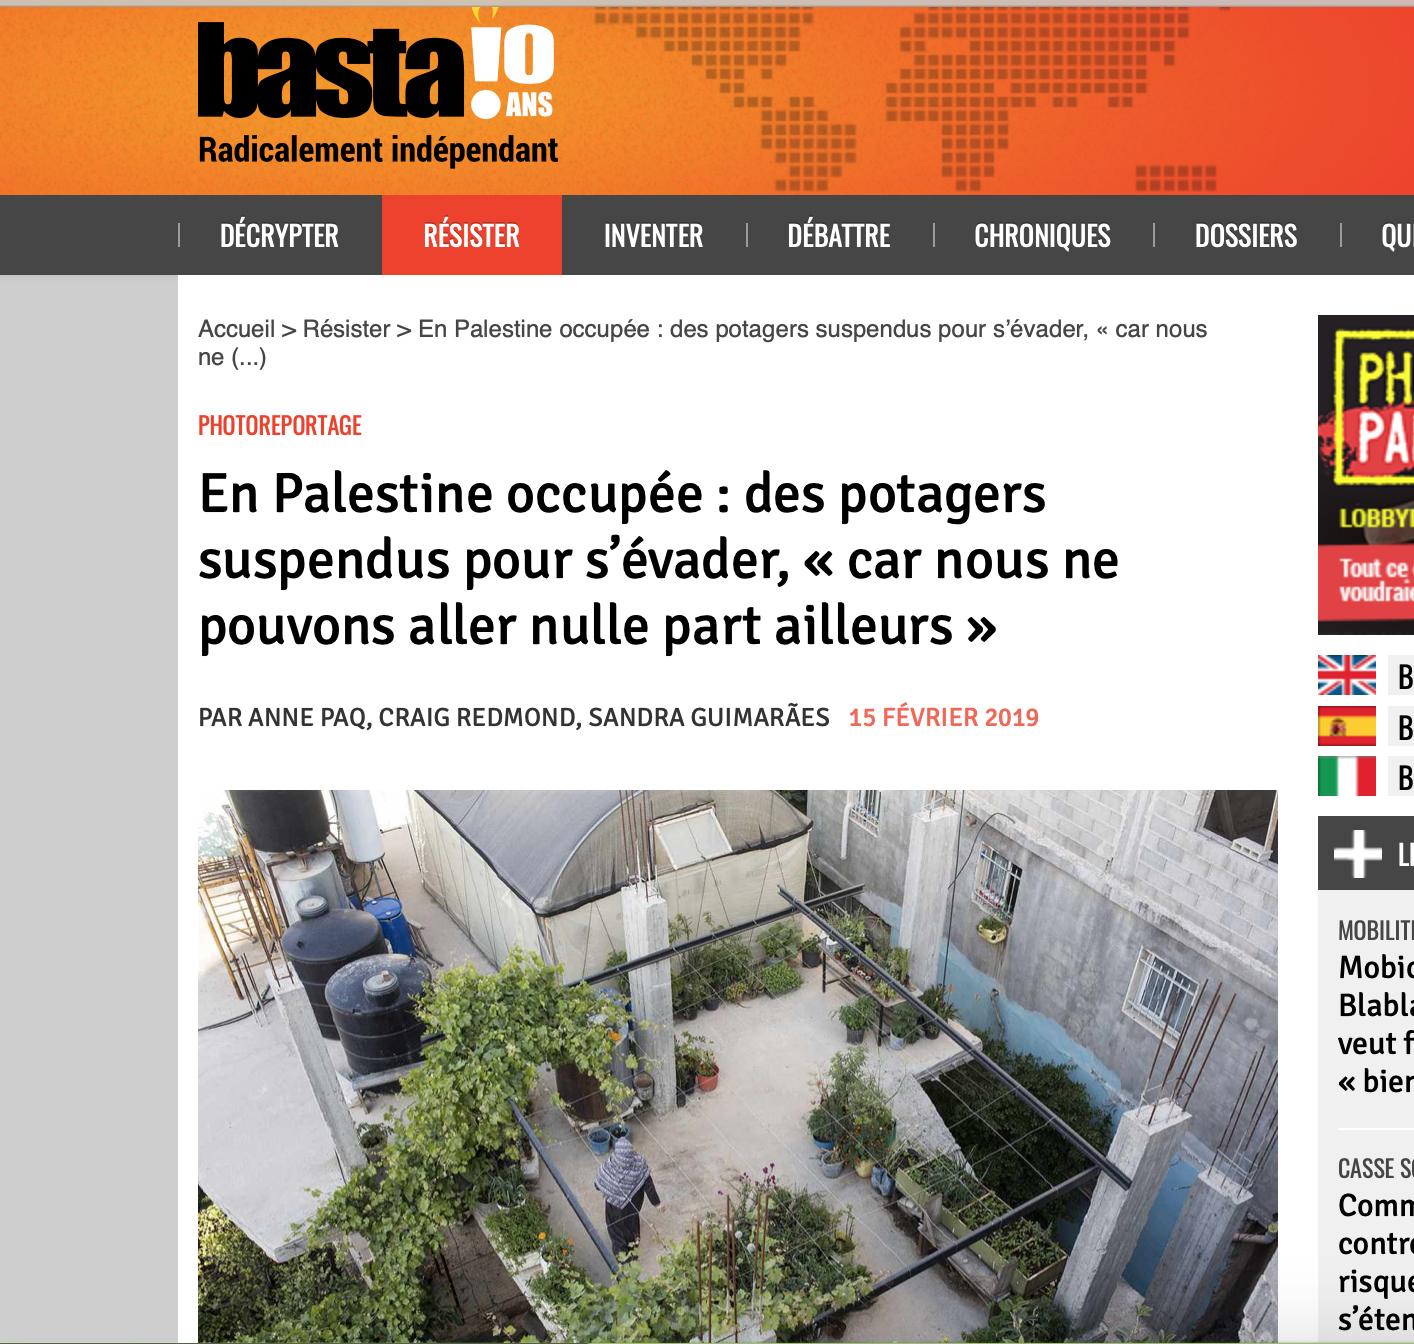 Baladi - Rooted Resistance article published in Basta! Magazine, February 2019